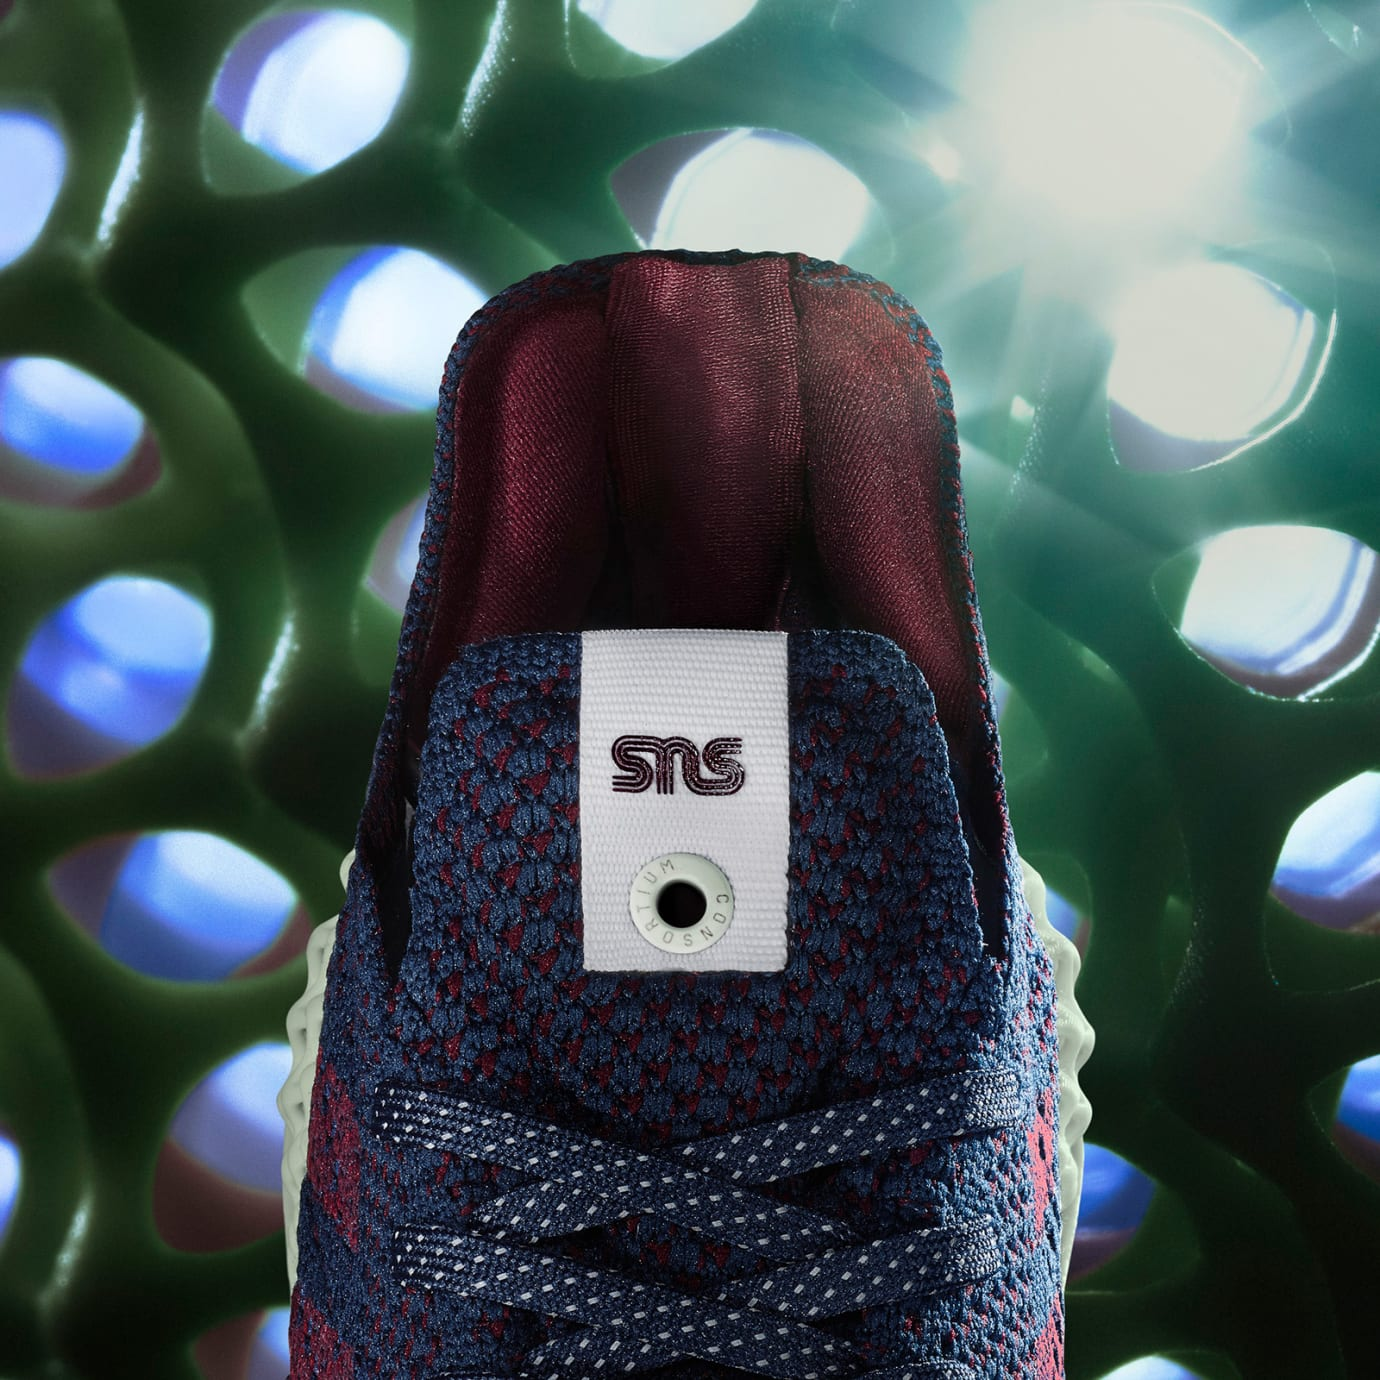 Sneakersnstuff x Adidas Consortium 4D B96533 (Tongue)